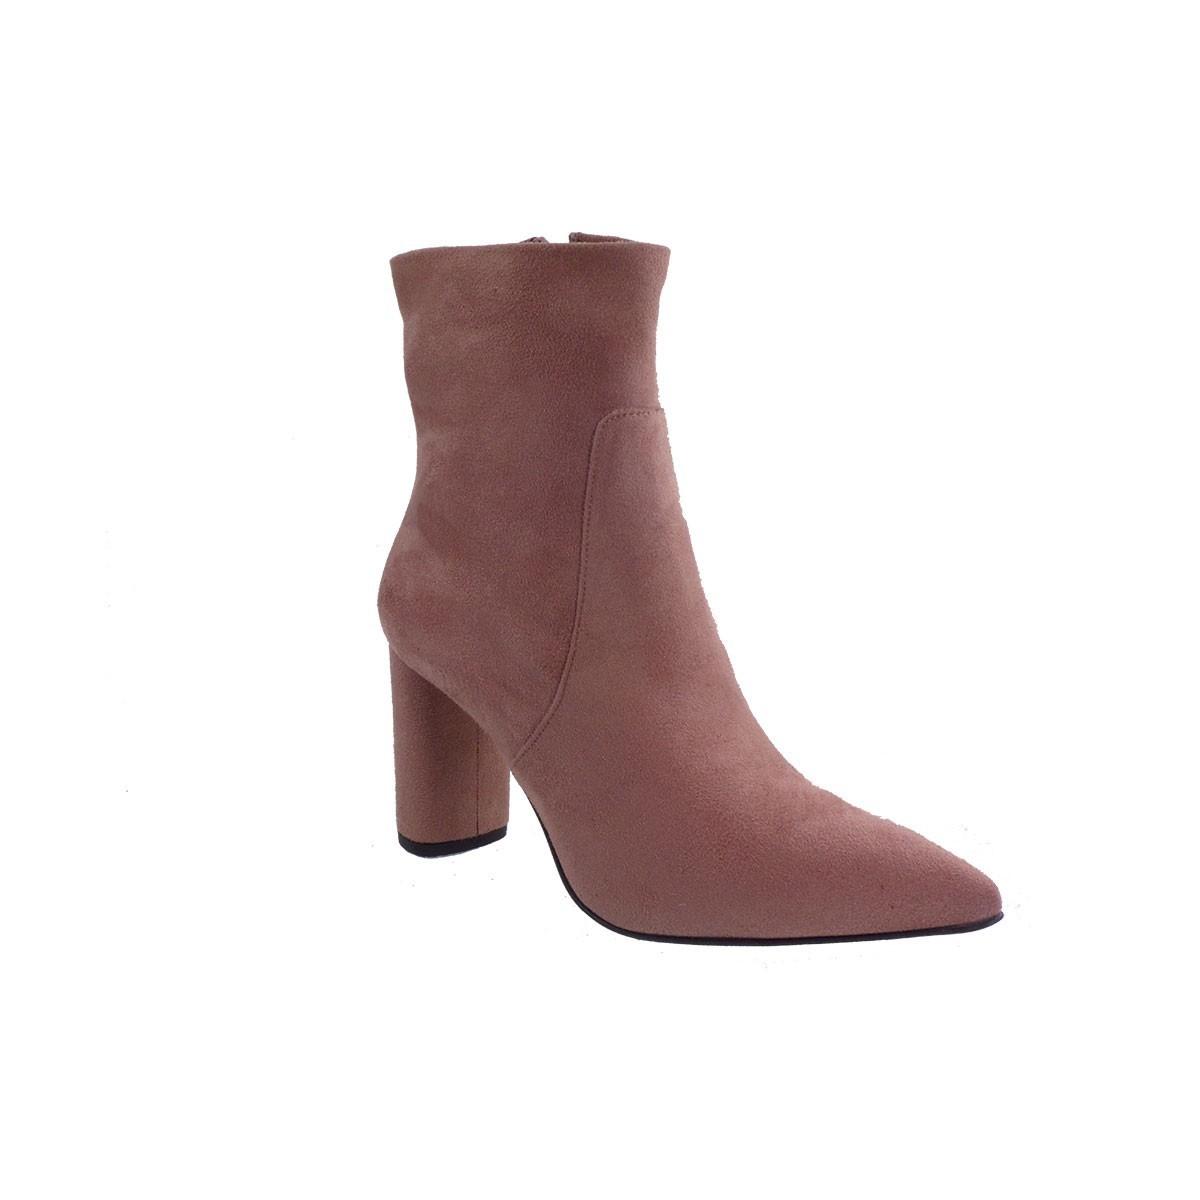 Fardoulis Shoes Γυναικεία Παπούτσια Μποτάκια 4311 Nude Kασ. Λικρα